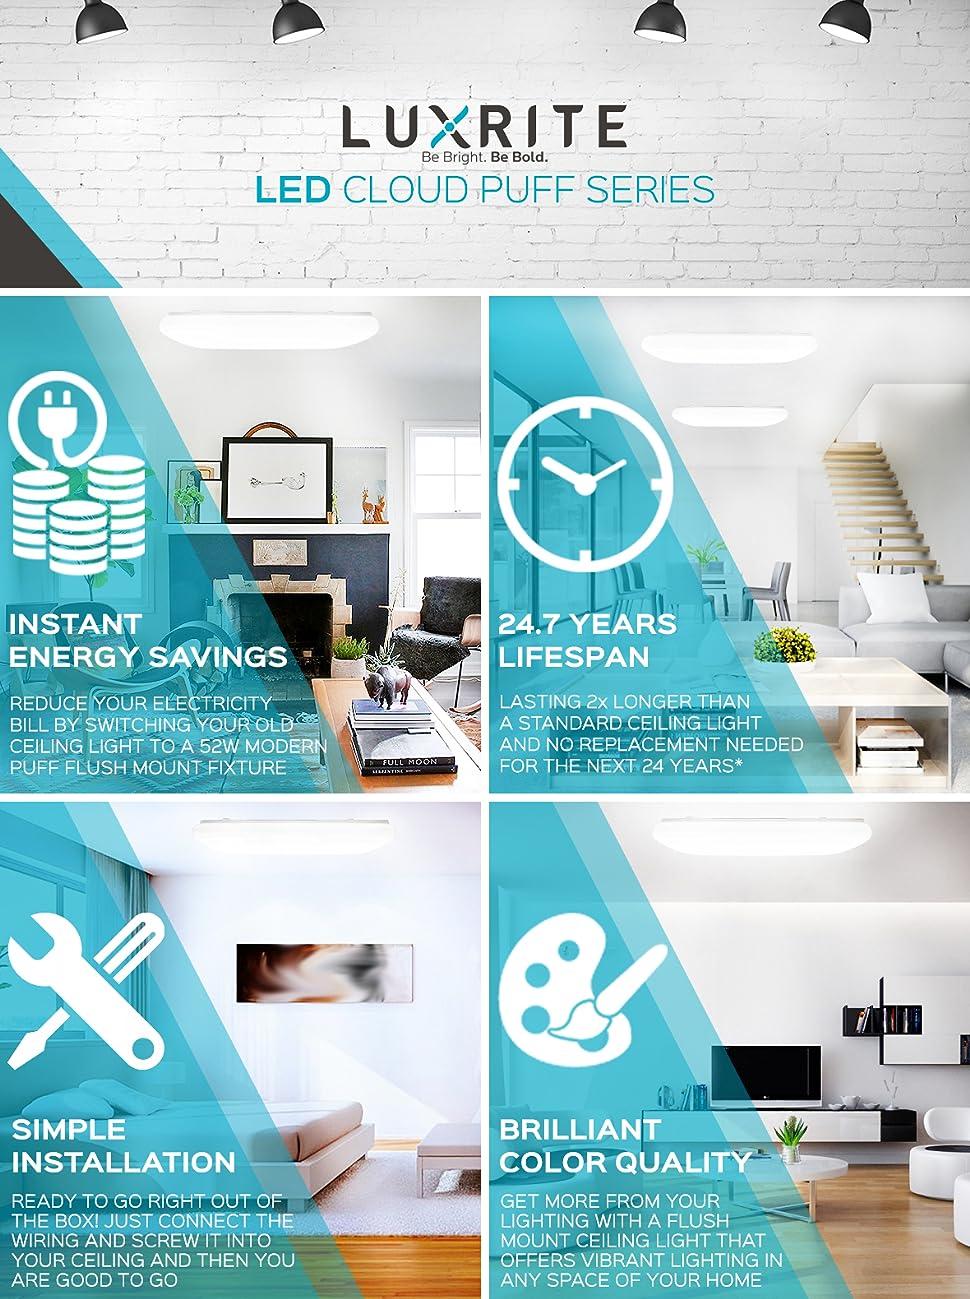 Luxrite 4FT Puff LED Flush Mount Ceiling Light Fixture, 52W, 5000K ...